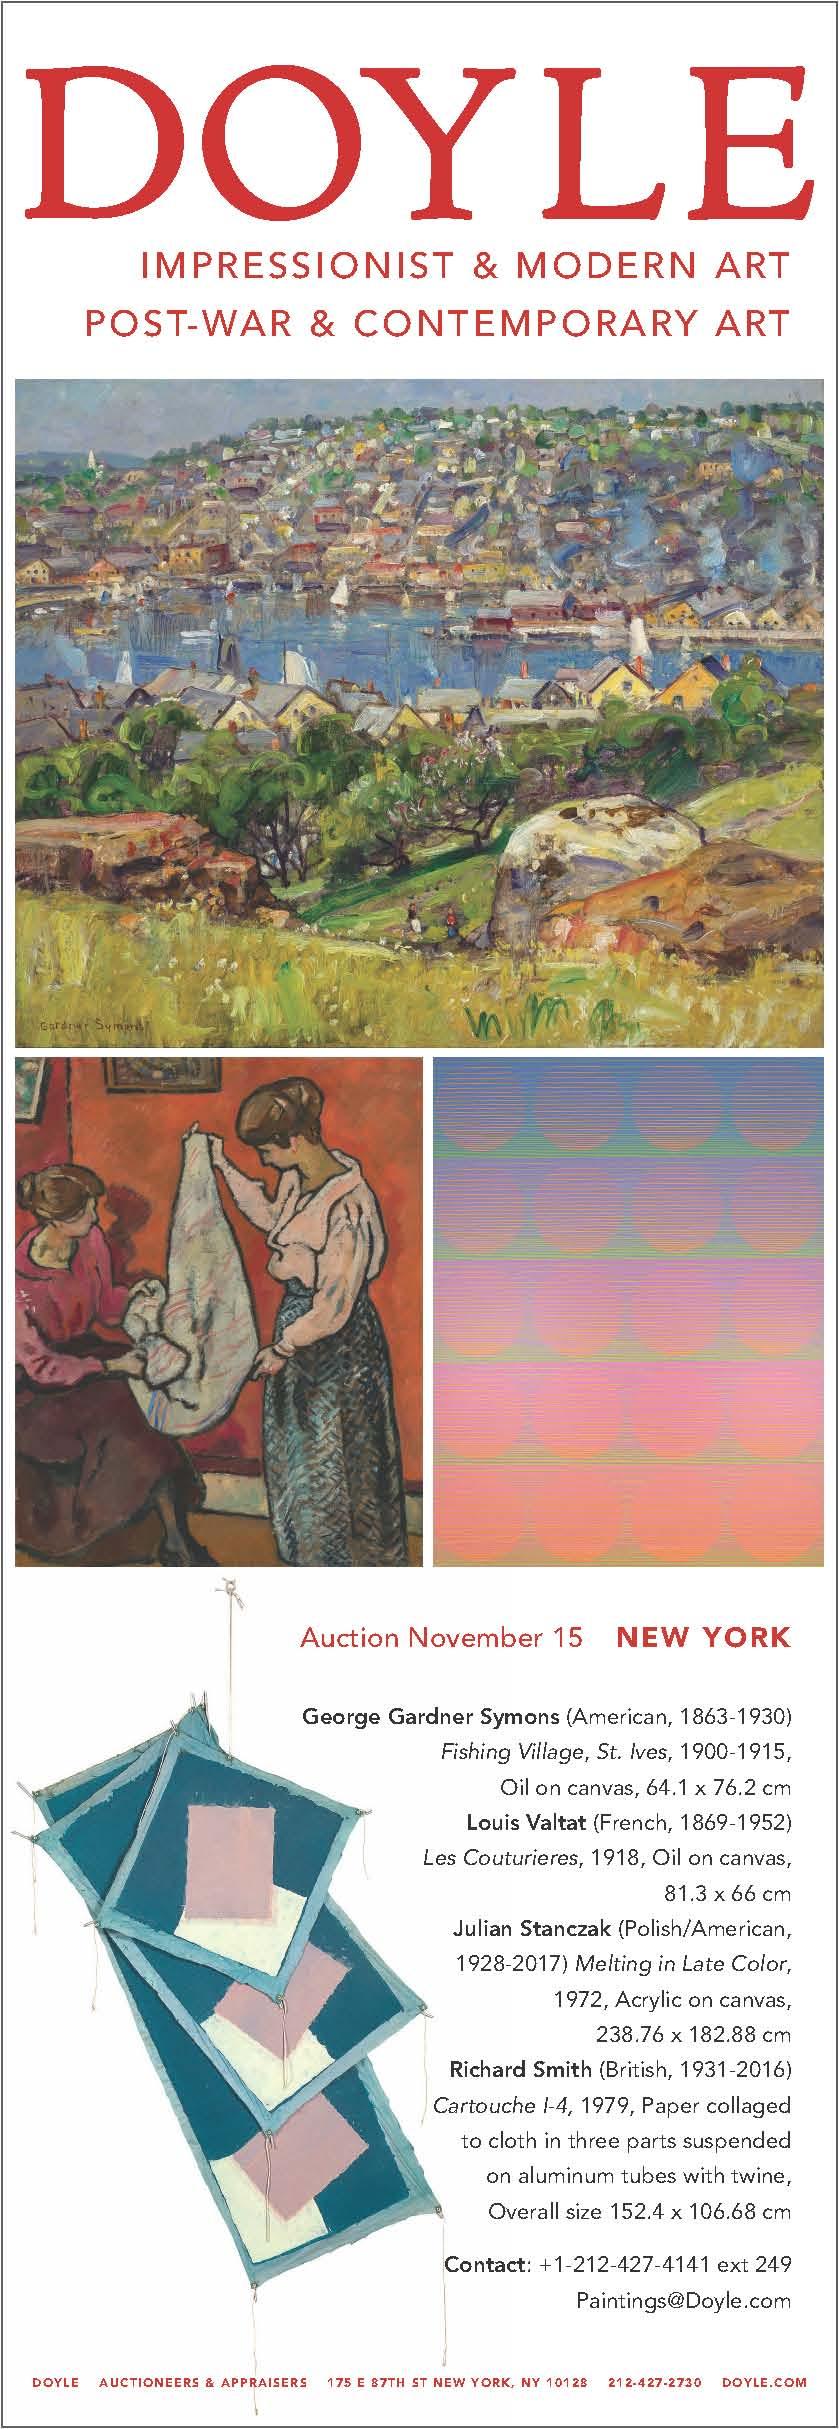 Doyle - Impressionist & Modern Art Post-War & Contemporay Art.jpg